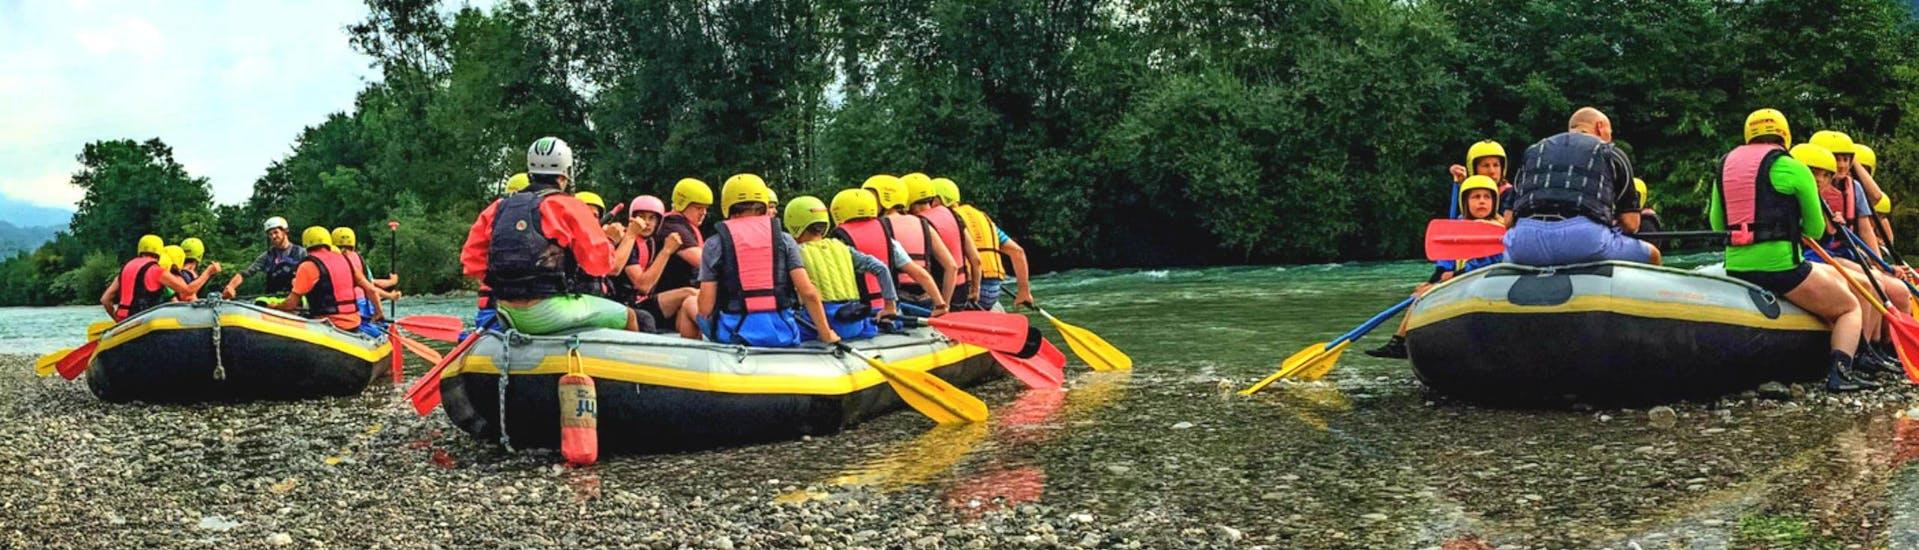 rafting-on-the-loisach-classic-wildwasser-werdenfels-hero